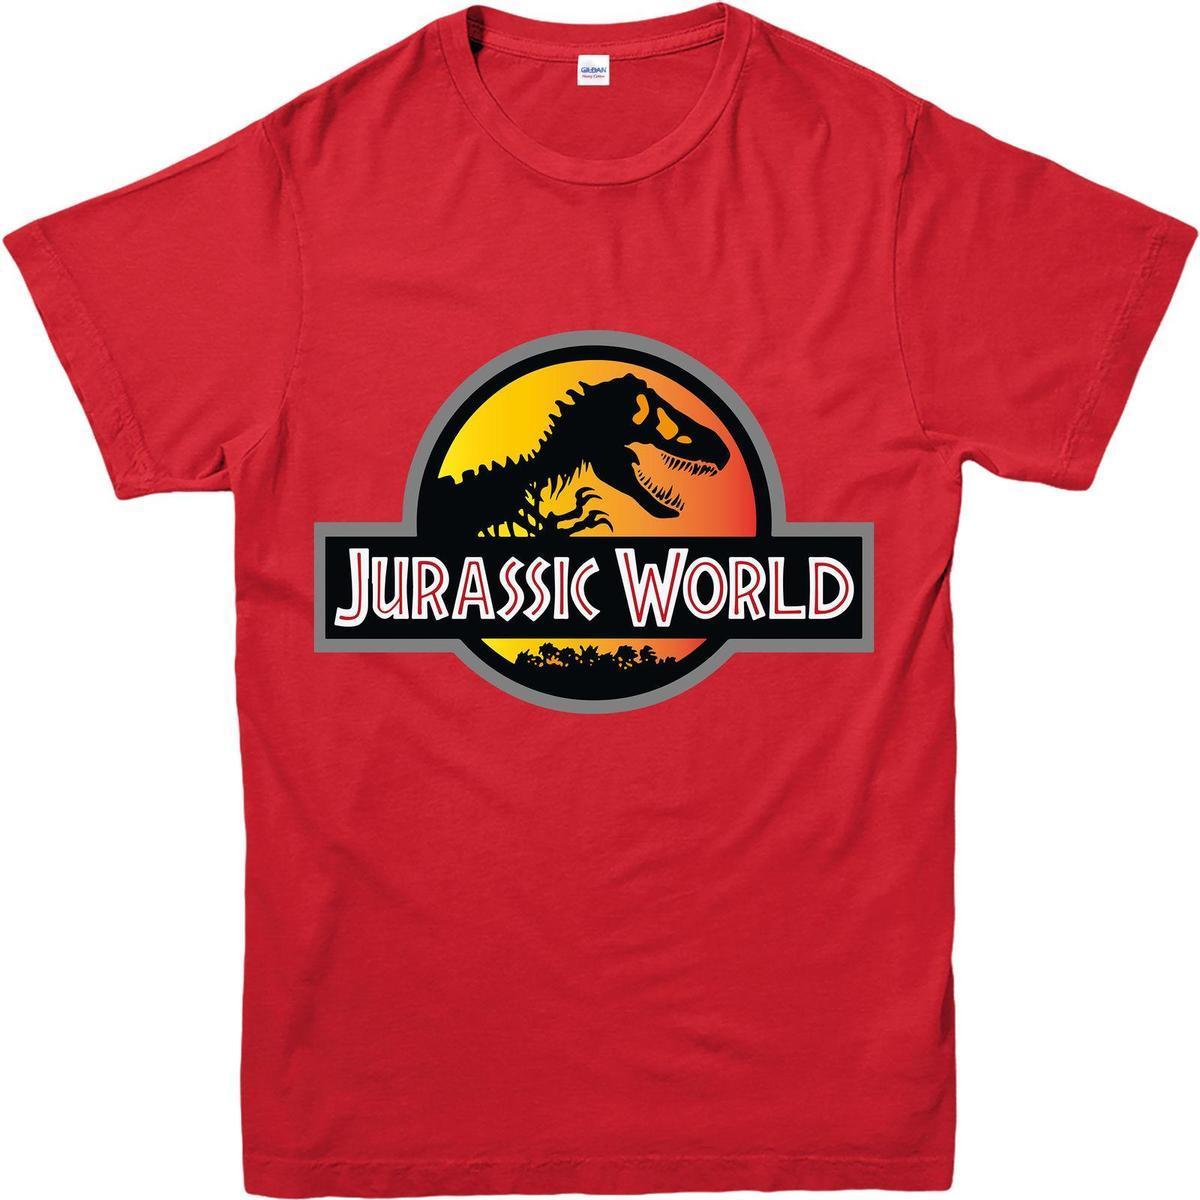 676b155f4 Jurassic World T Shirt Movie Jurassic Park Logo T Shirt Dinosaur Ringer Tee  Shirts Online Cool Tee Shirts From Linnan00005, $14.67| DHgate.Com